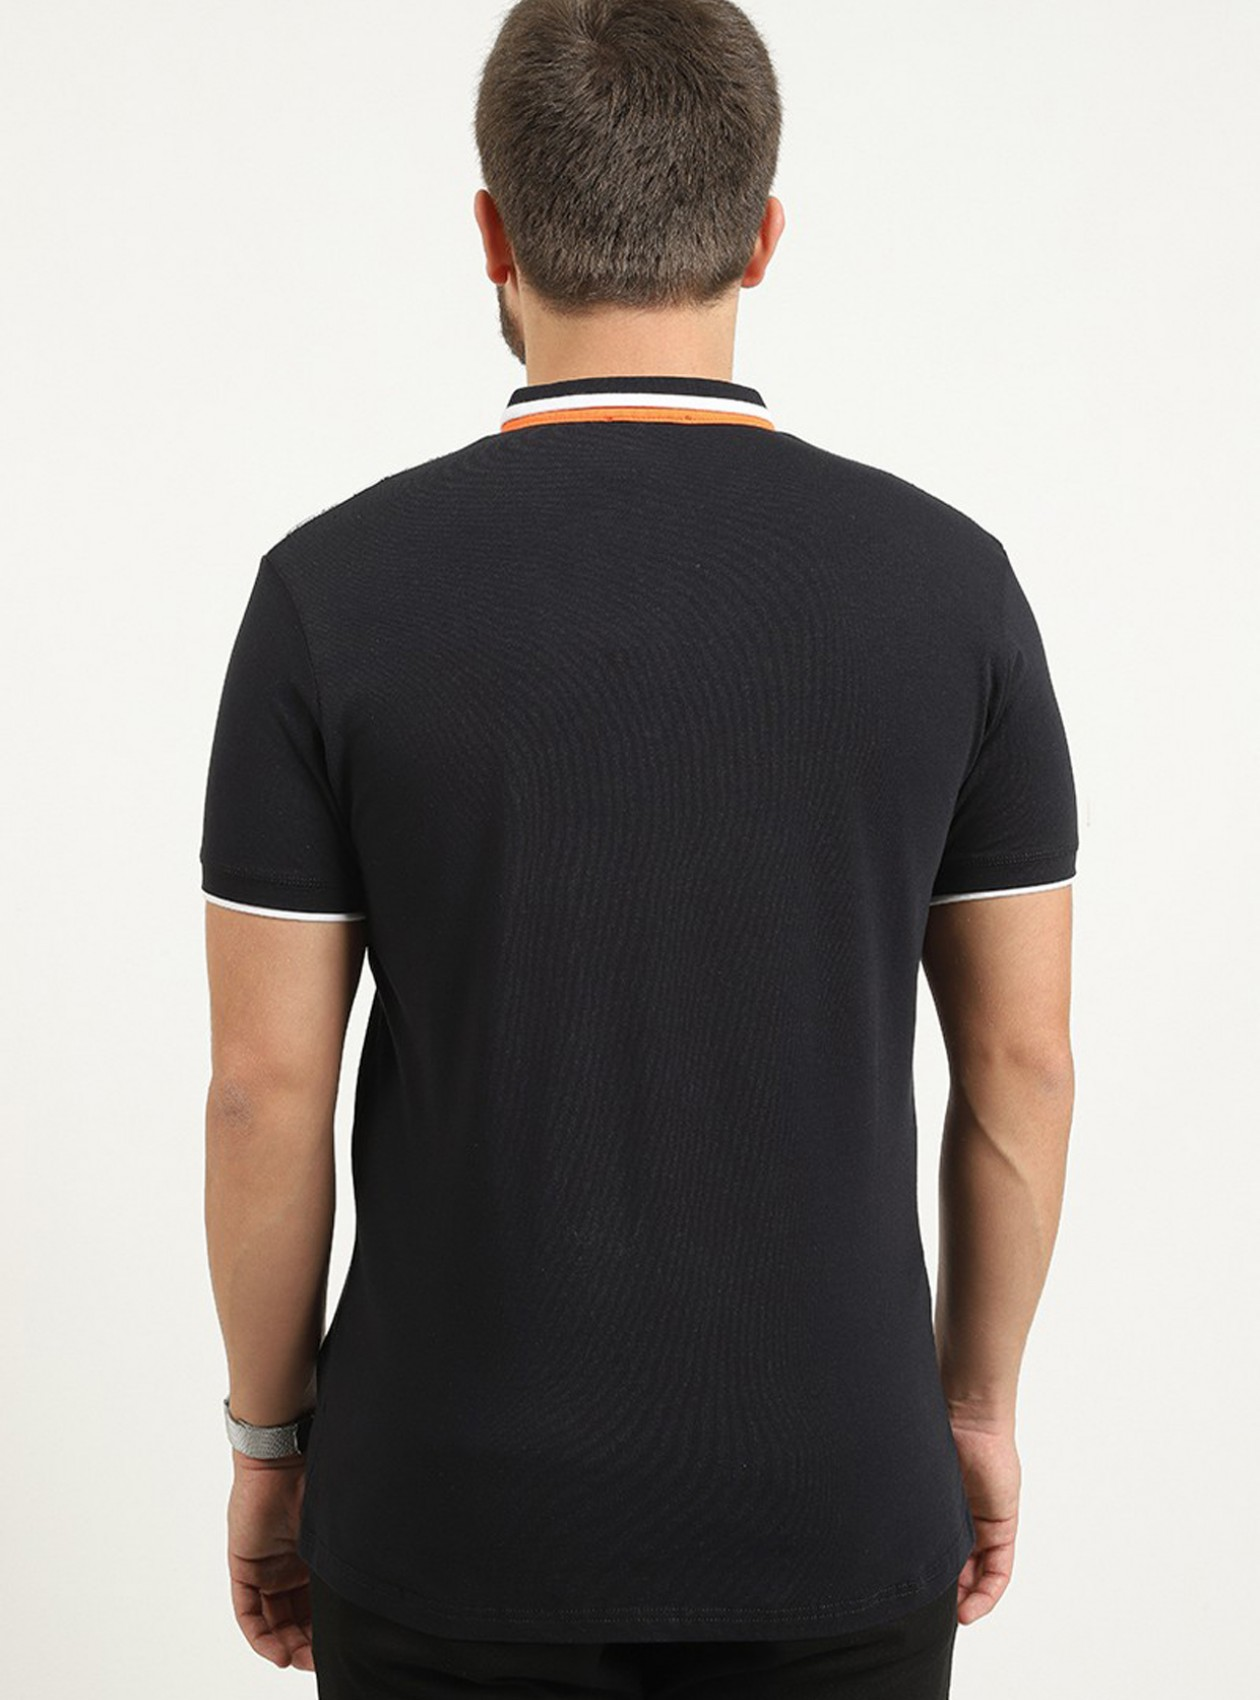 Polo marine manches courtes avec logo plaque poitrine